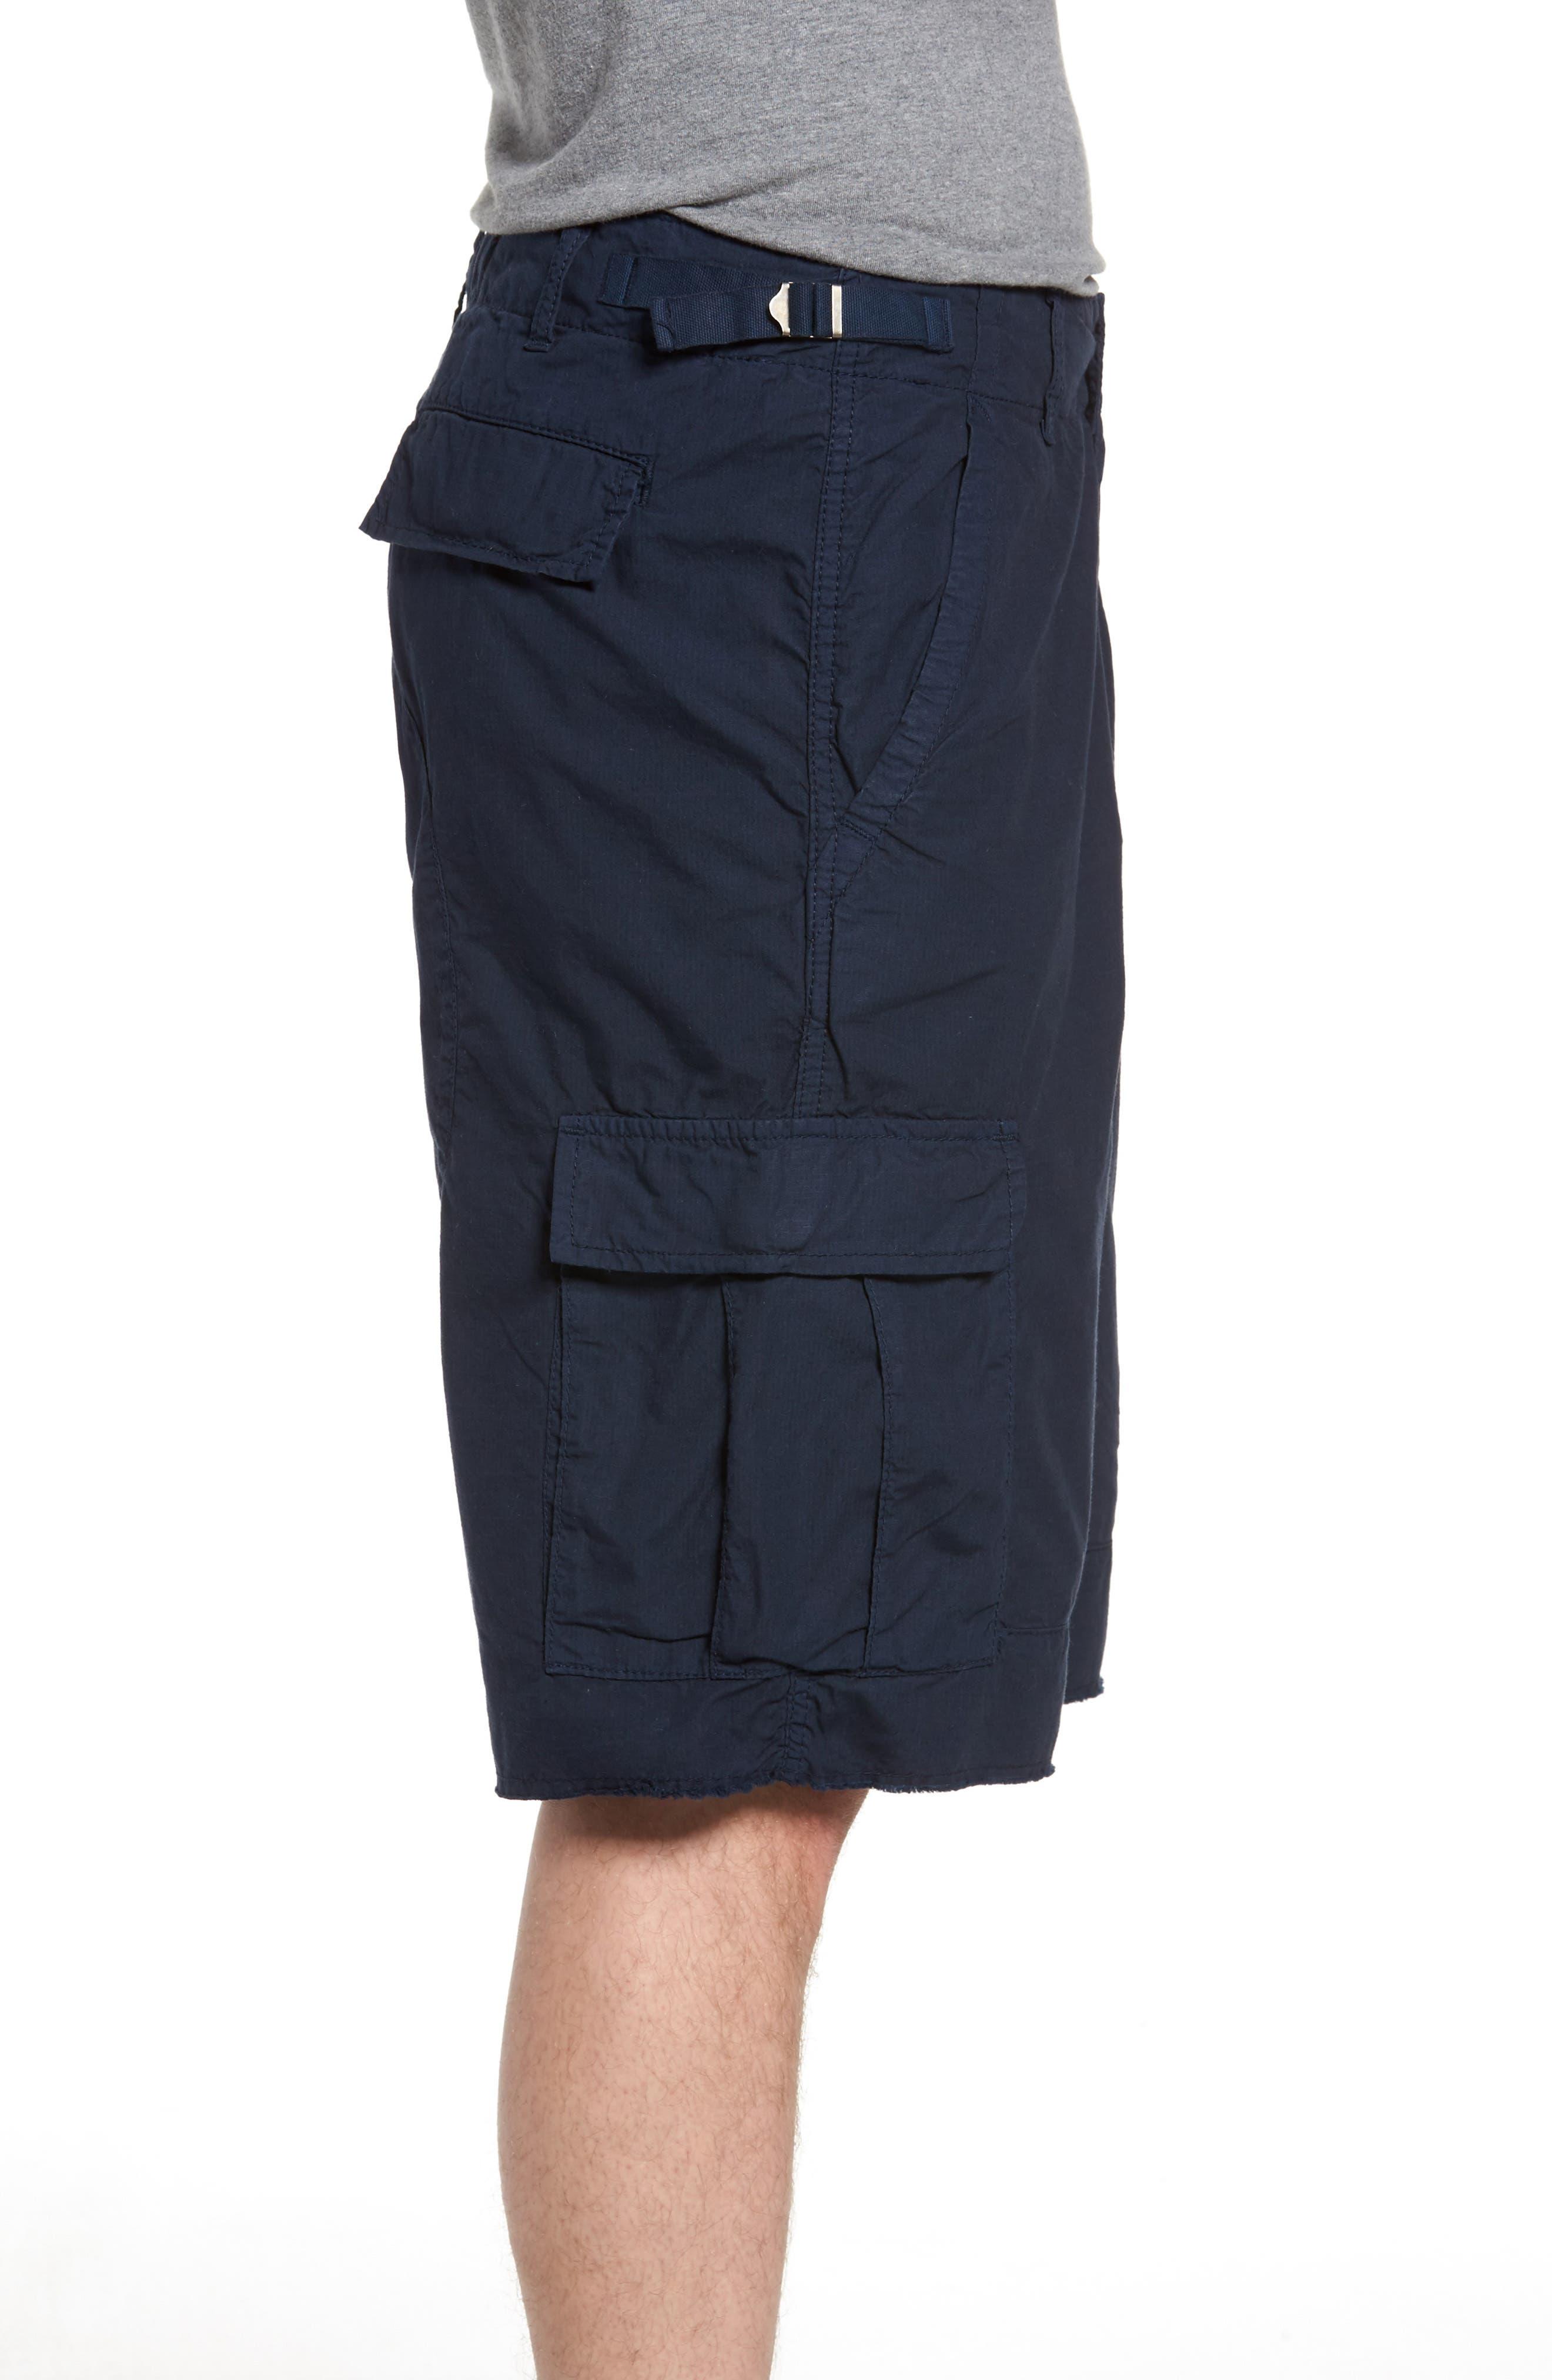 'Oxnard' Cargo Shorts,                             Alternate thumbnail 3, color,                             Navy